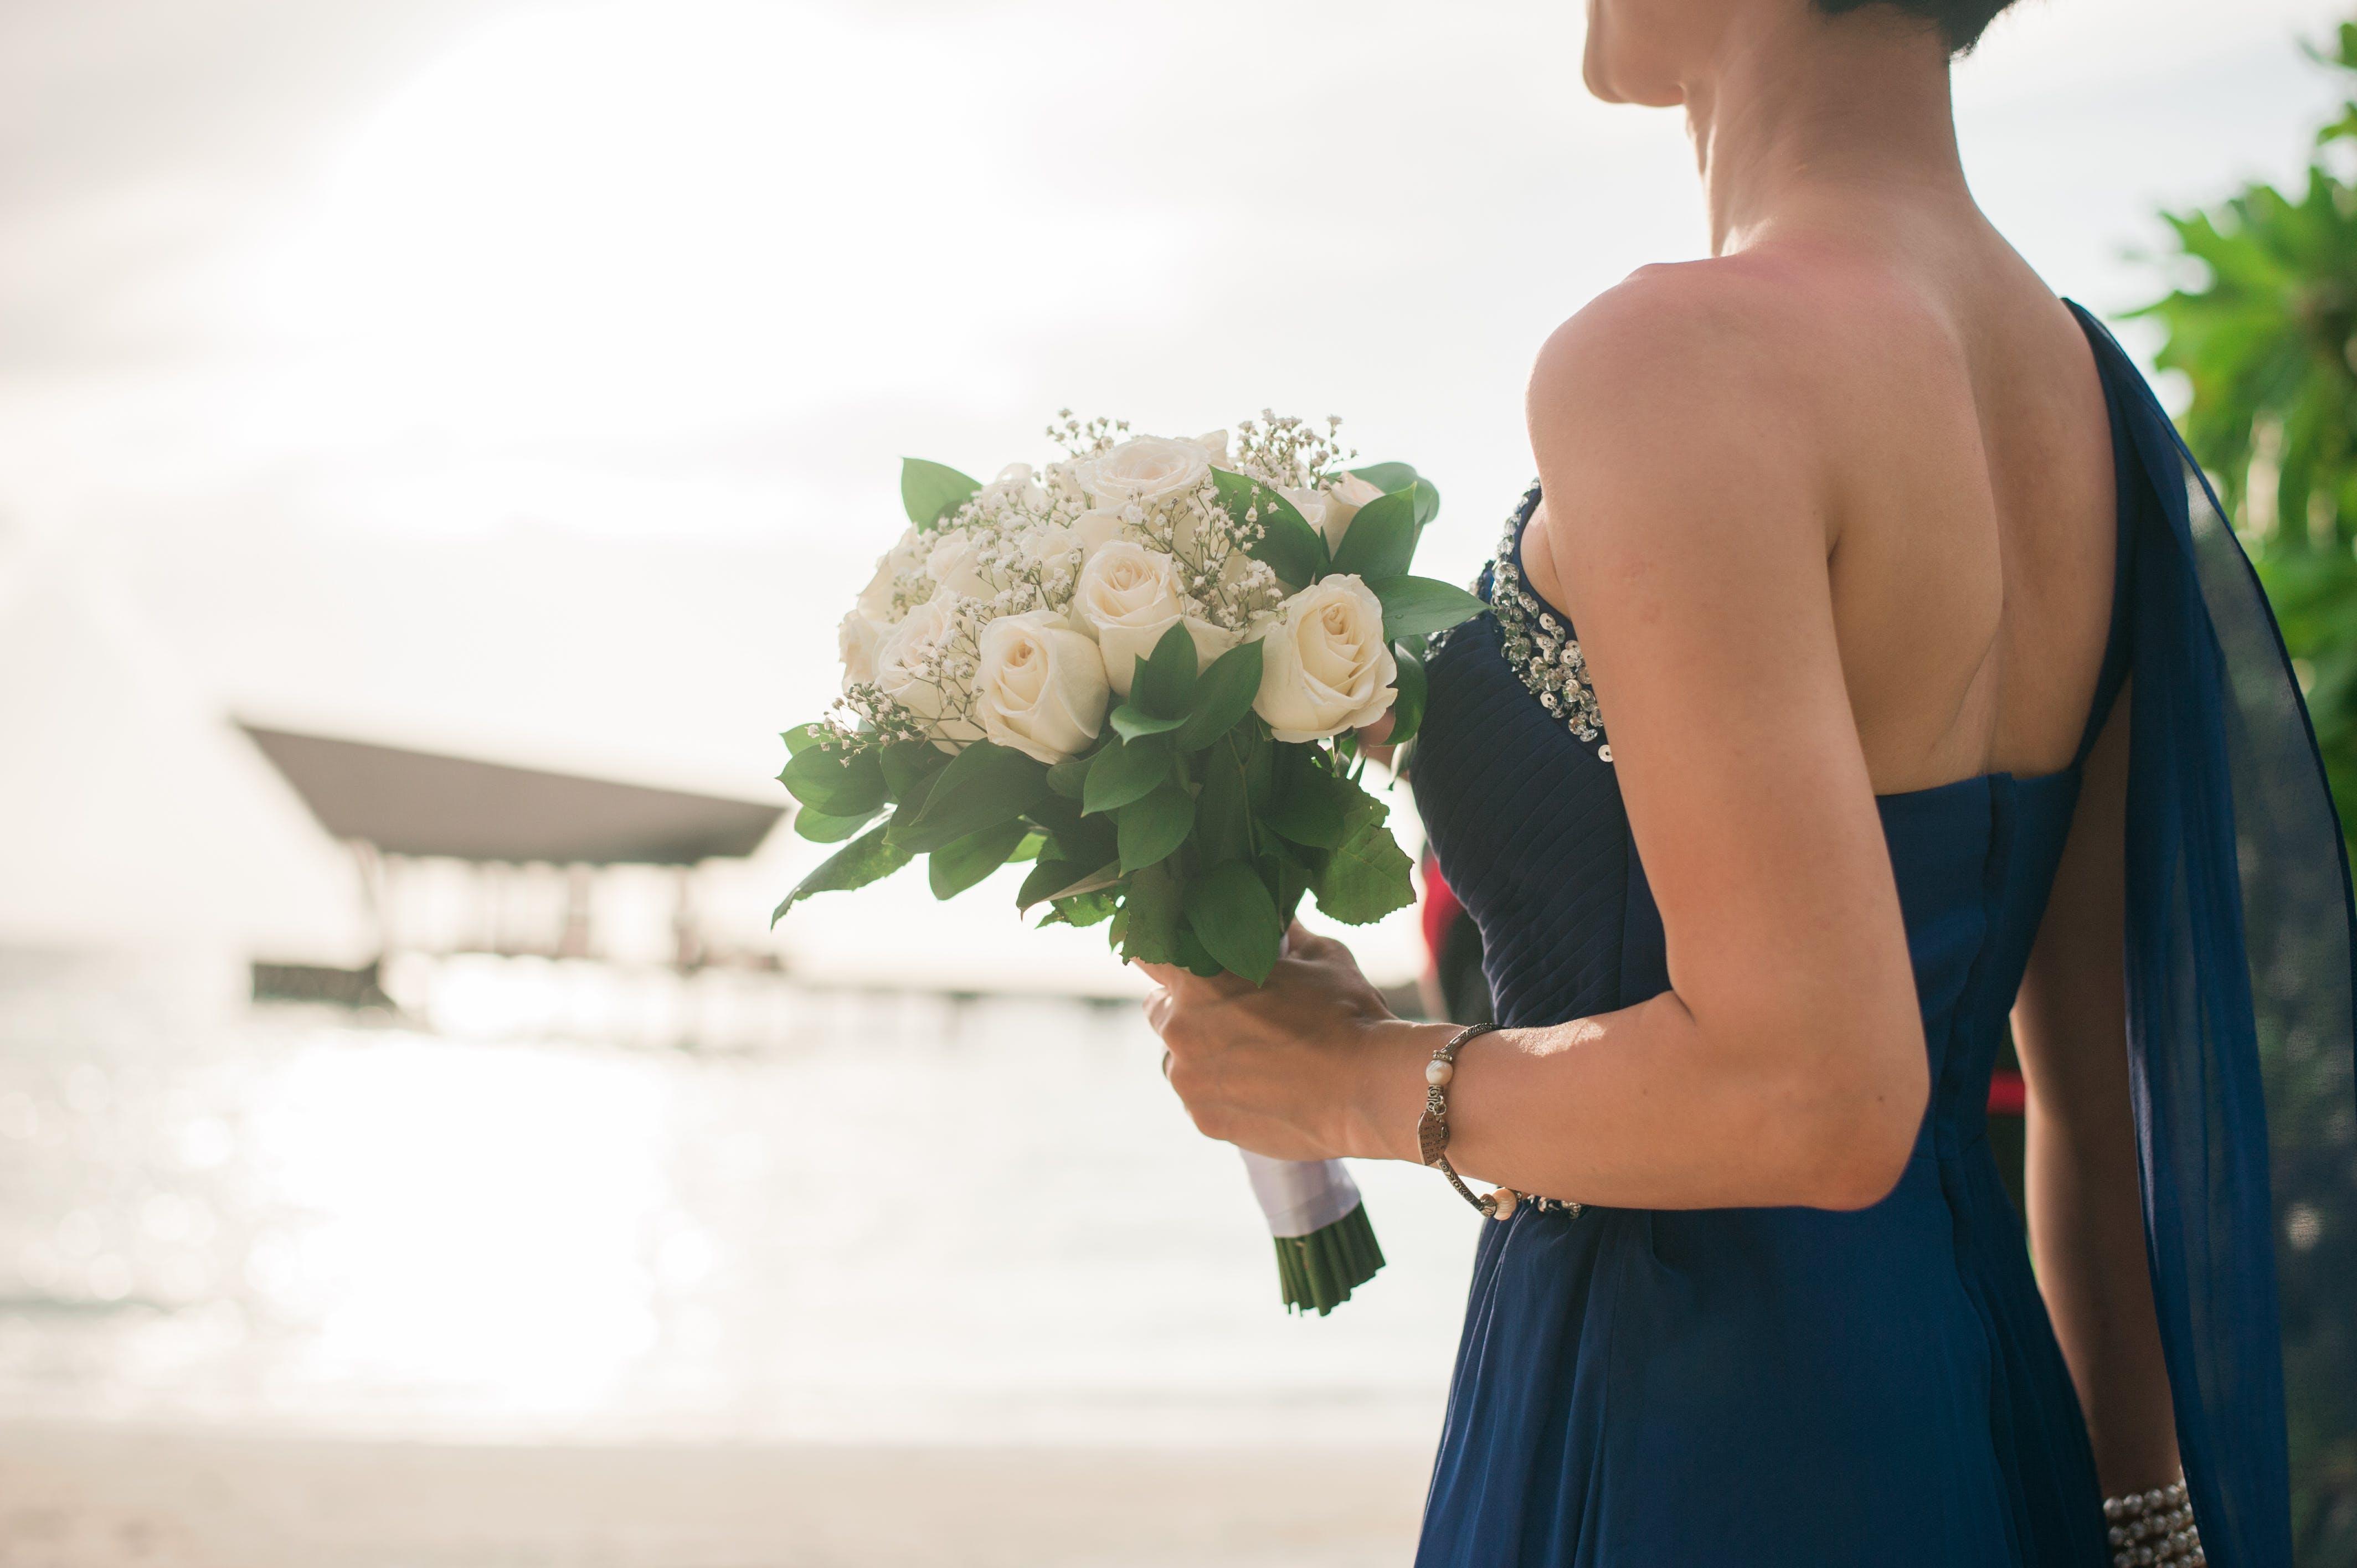 Woman Wearing Blue Dress Holding White Petaled Flower Bouquet